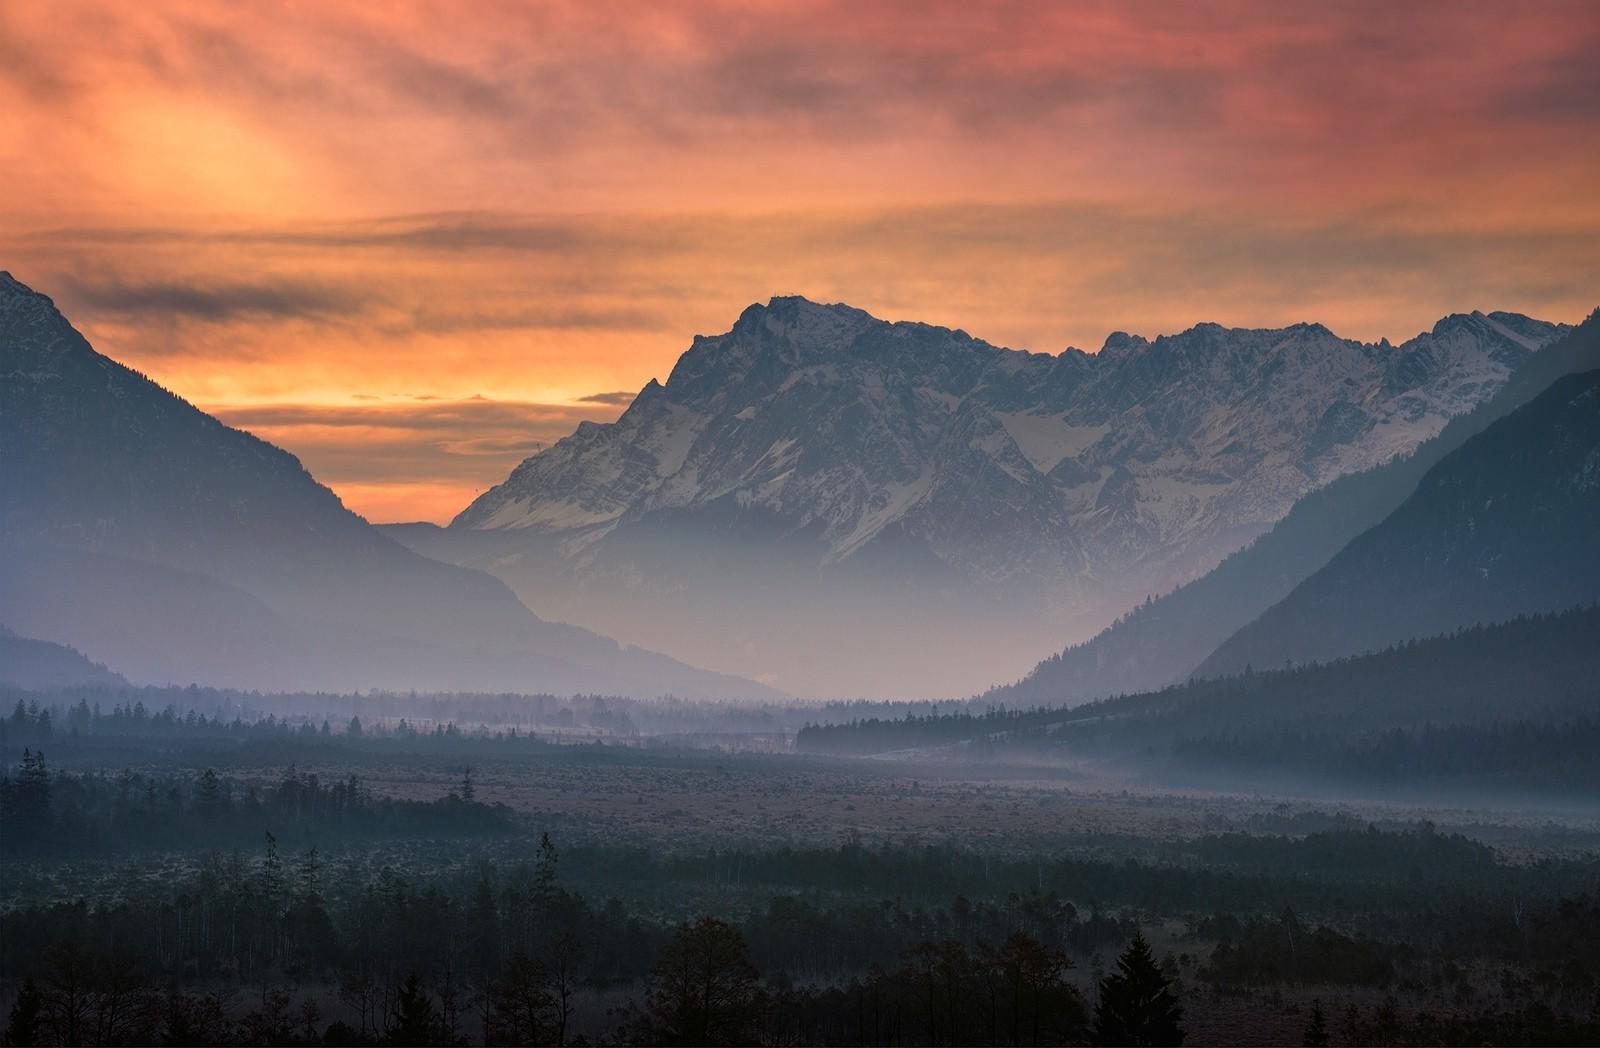 Wallpaper Landscape Forest Mountains Sunset Hill